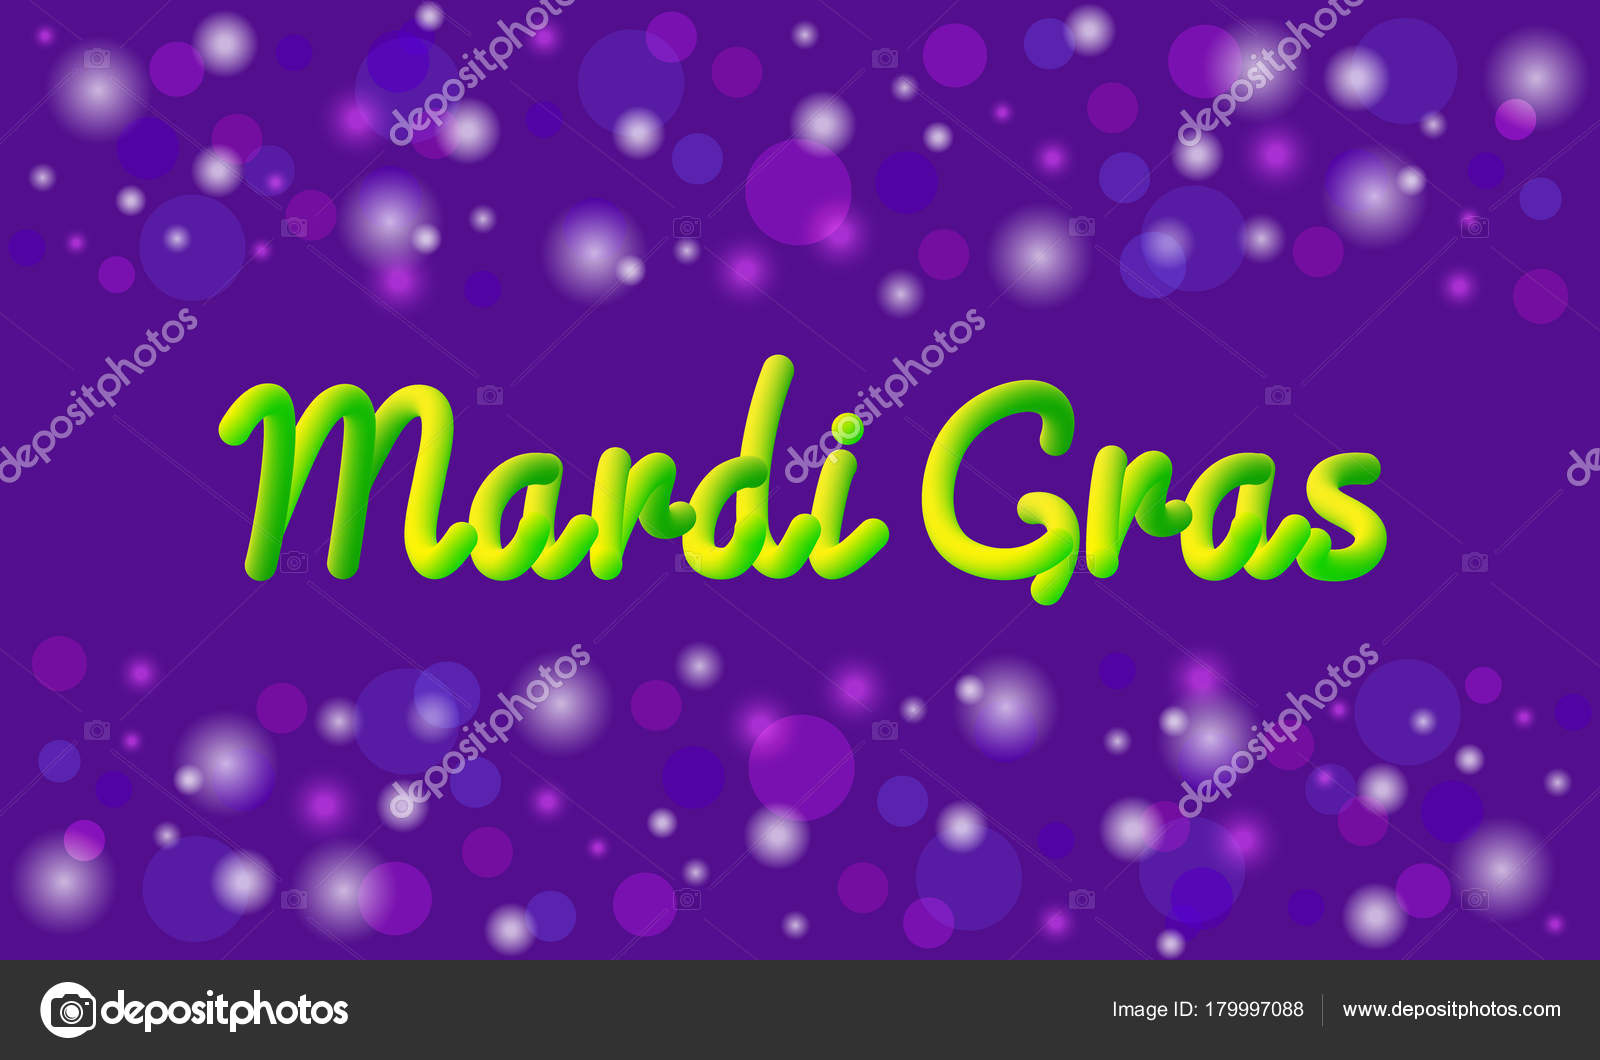 Mardi gras theme vector banner or greeting card 3d effect text mardi gras theme vector banner or greeting card 3d effect text traditional violet m4hsunfo